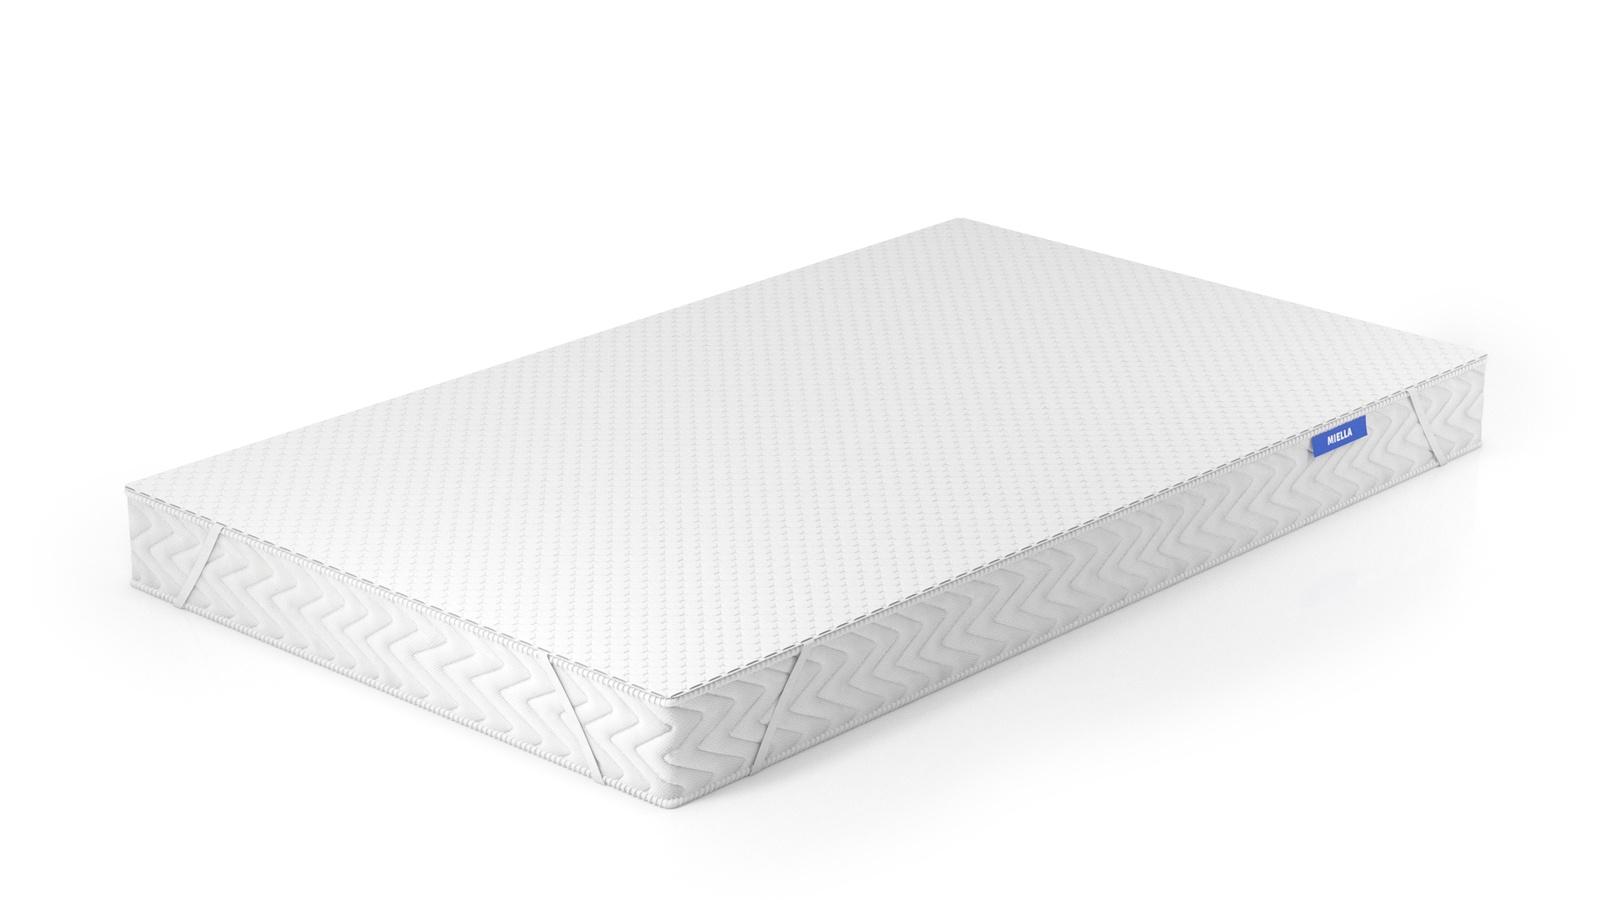 Наматрасник MIELLA Aqua Stop Lux, 200х190 см, непромокаемый, трикотаж, мембрана белый MIELLA